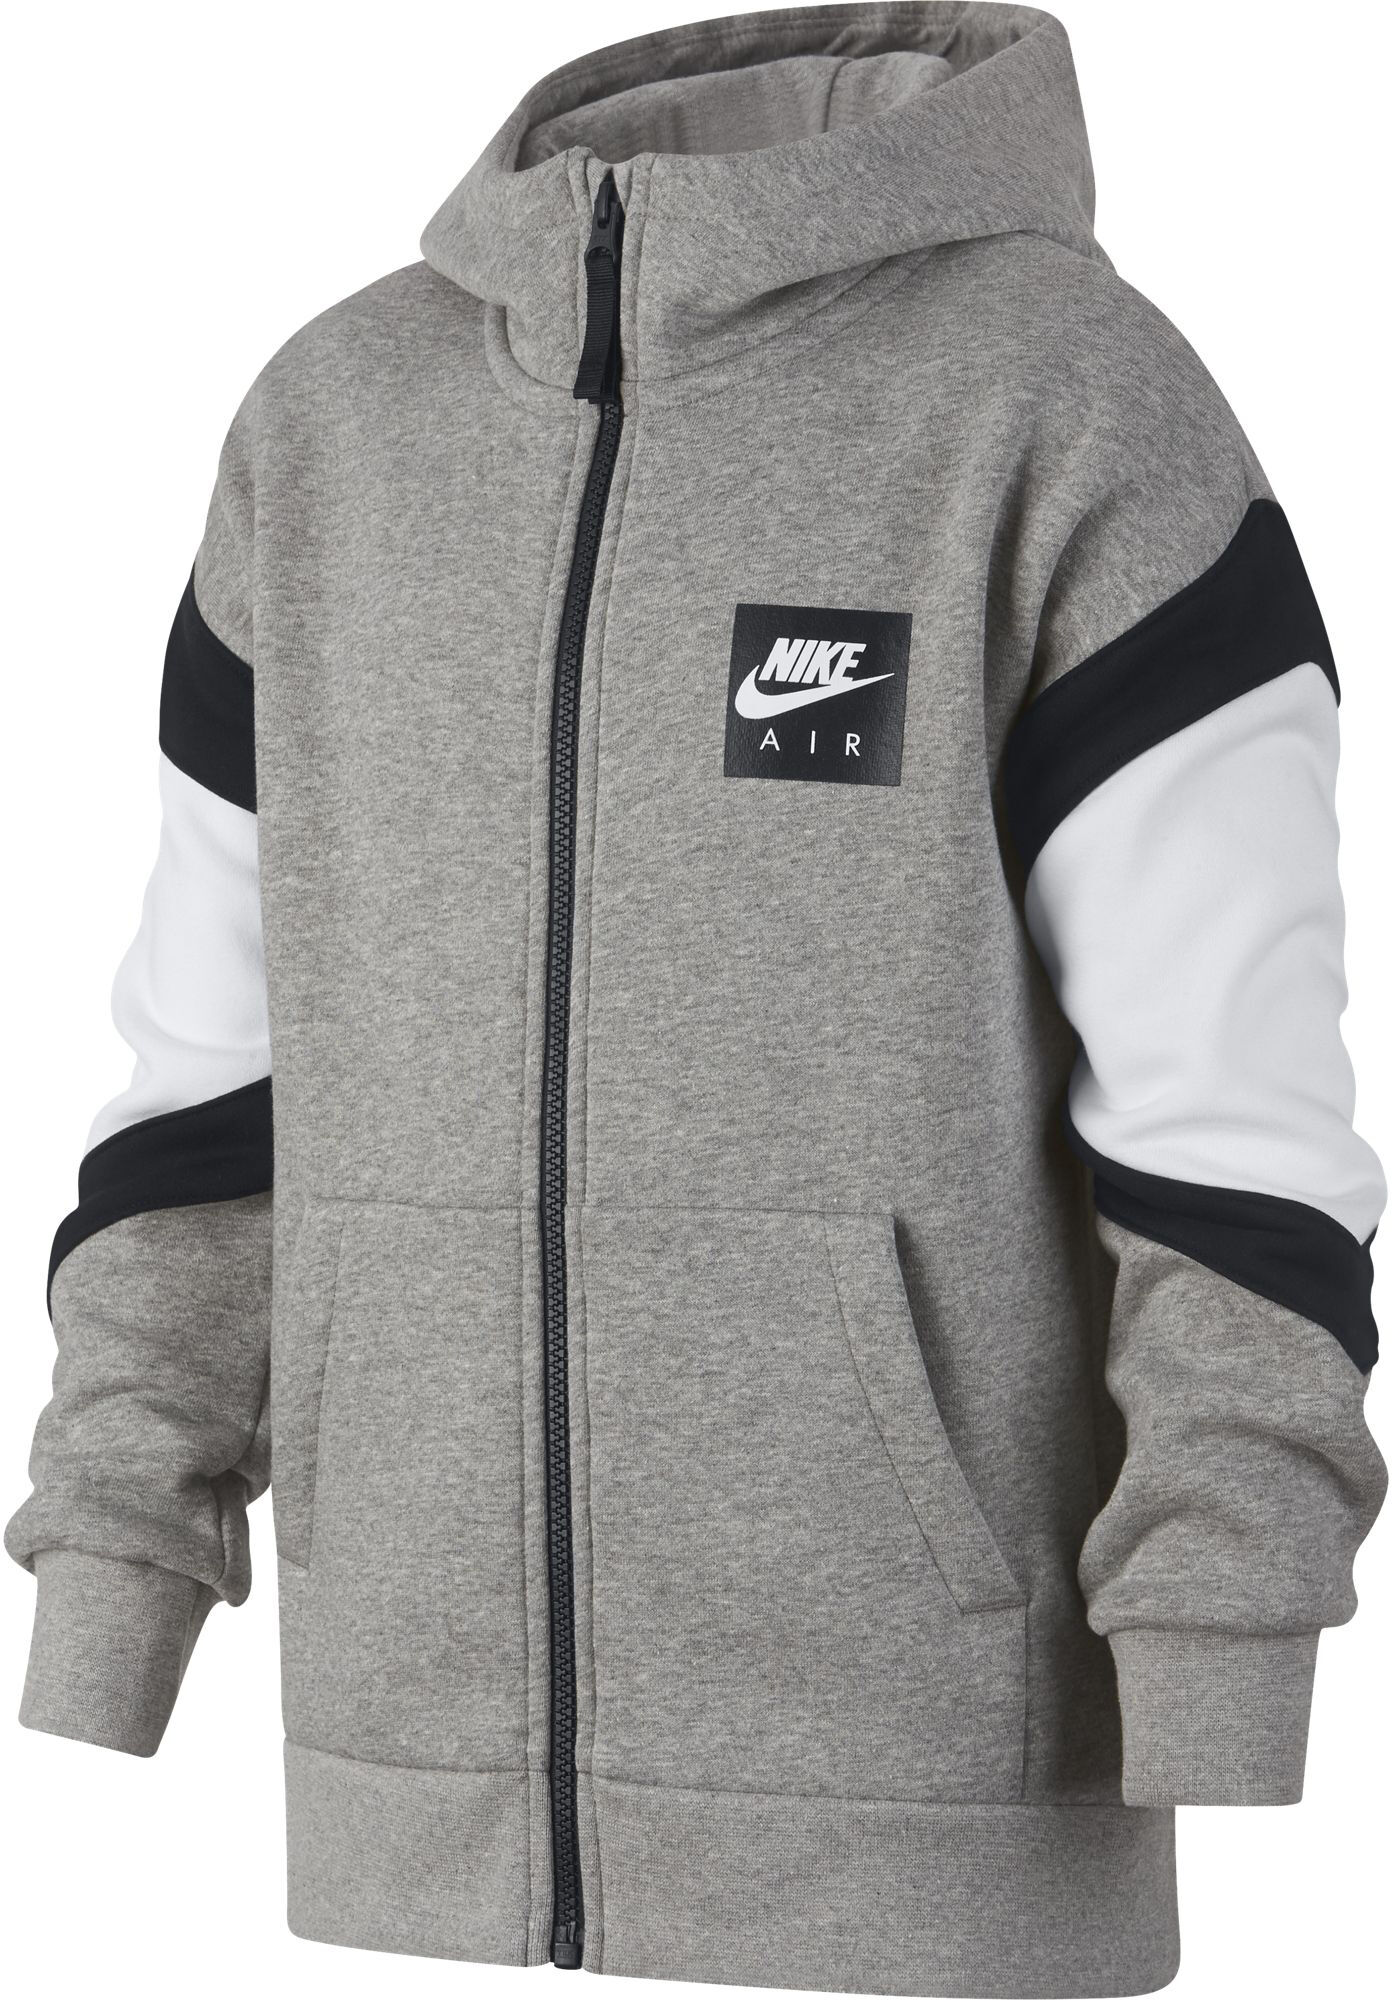 Intersport Nike Intersport Fitness Nike Sudaderas Sudaderas Fitness Nike Pwxqn0ZIpt